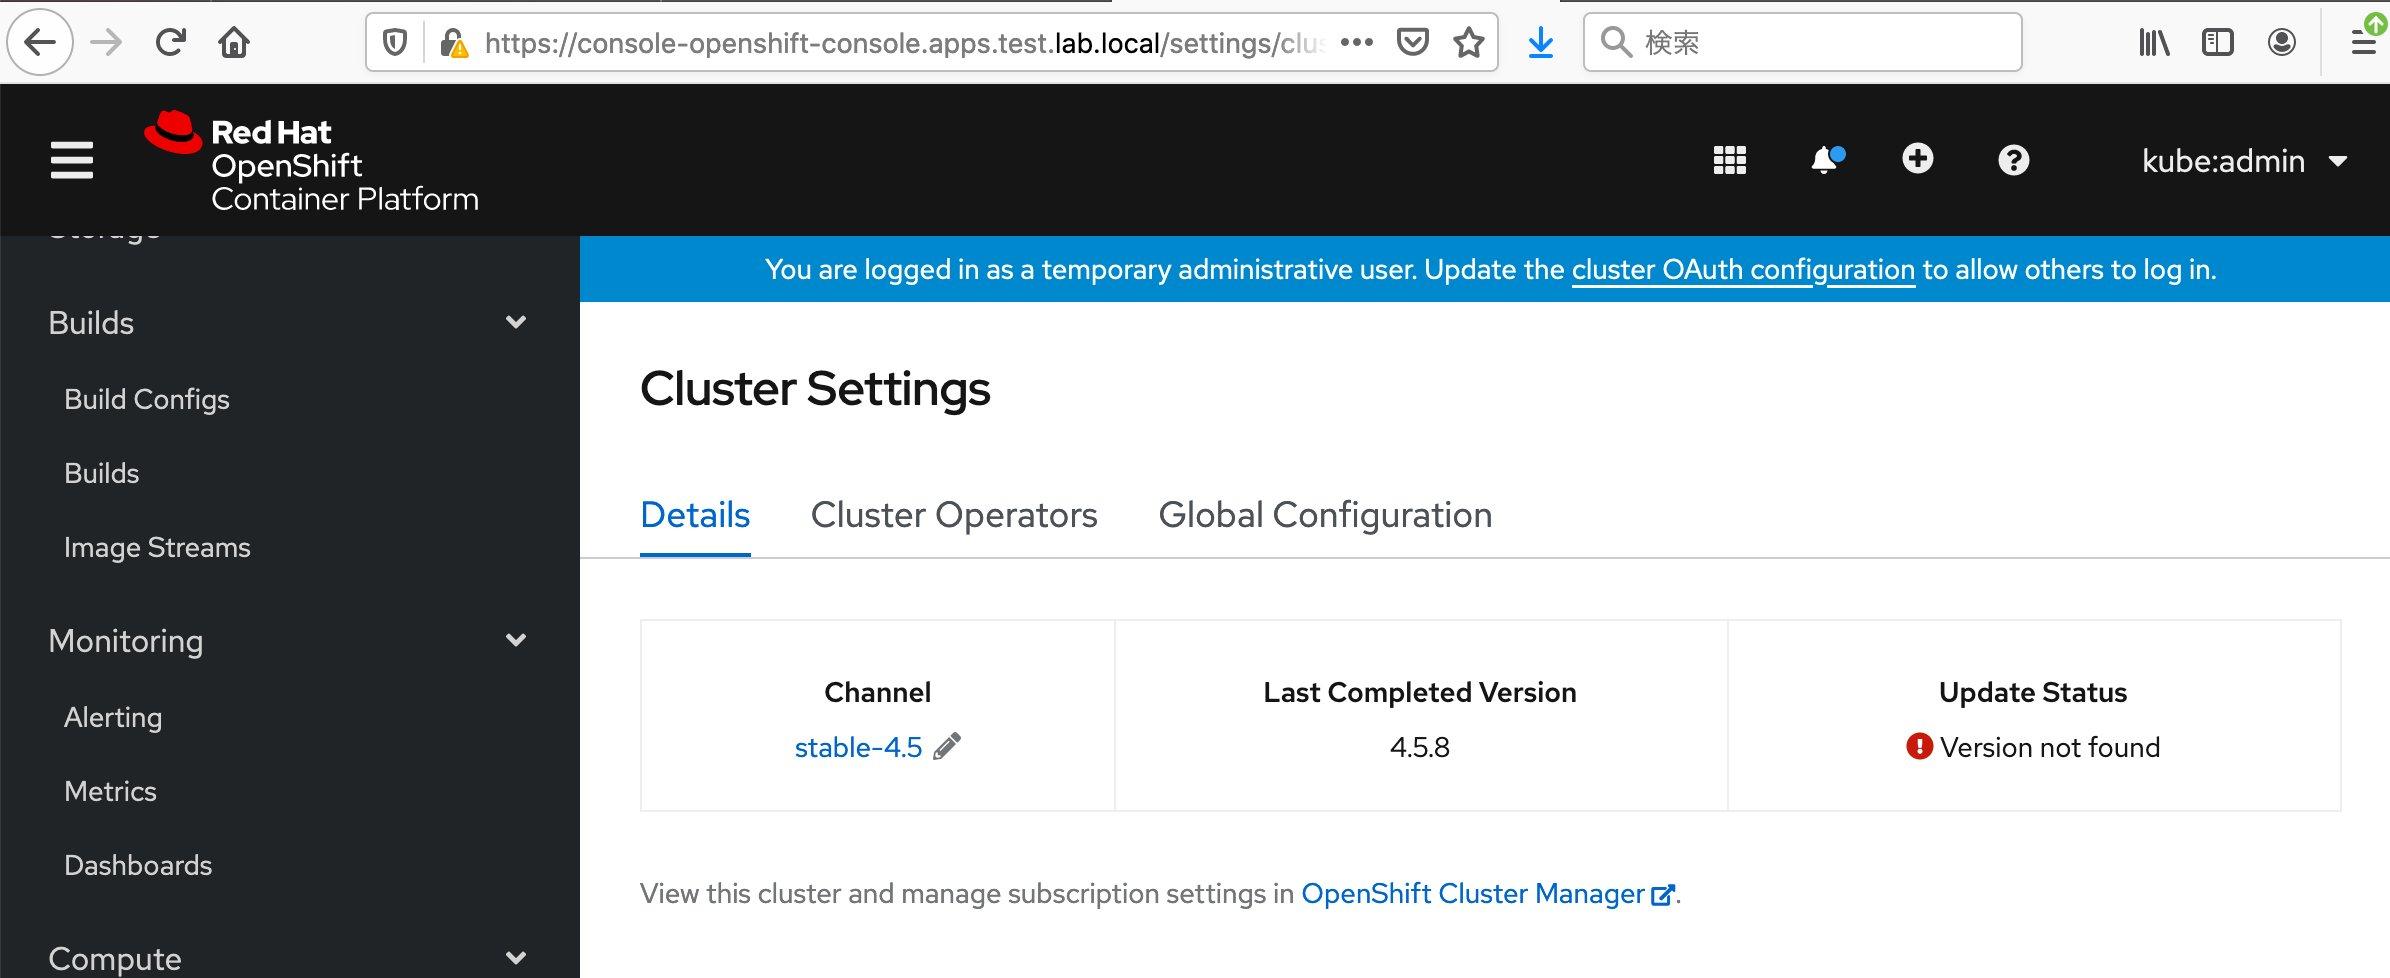 OpenShift 4.5